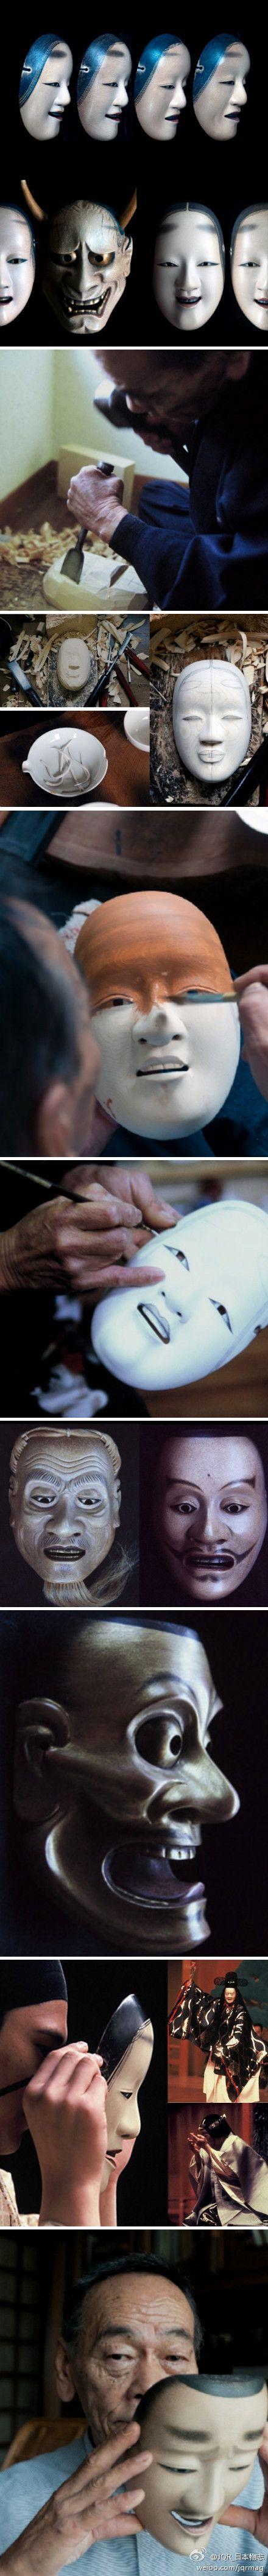 Noh mask artist, Koichi TAKATSU 能面师髙津紘一(1941-2011)Japan                                                                                                                                                                                 Más